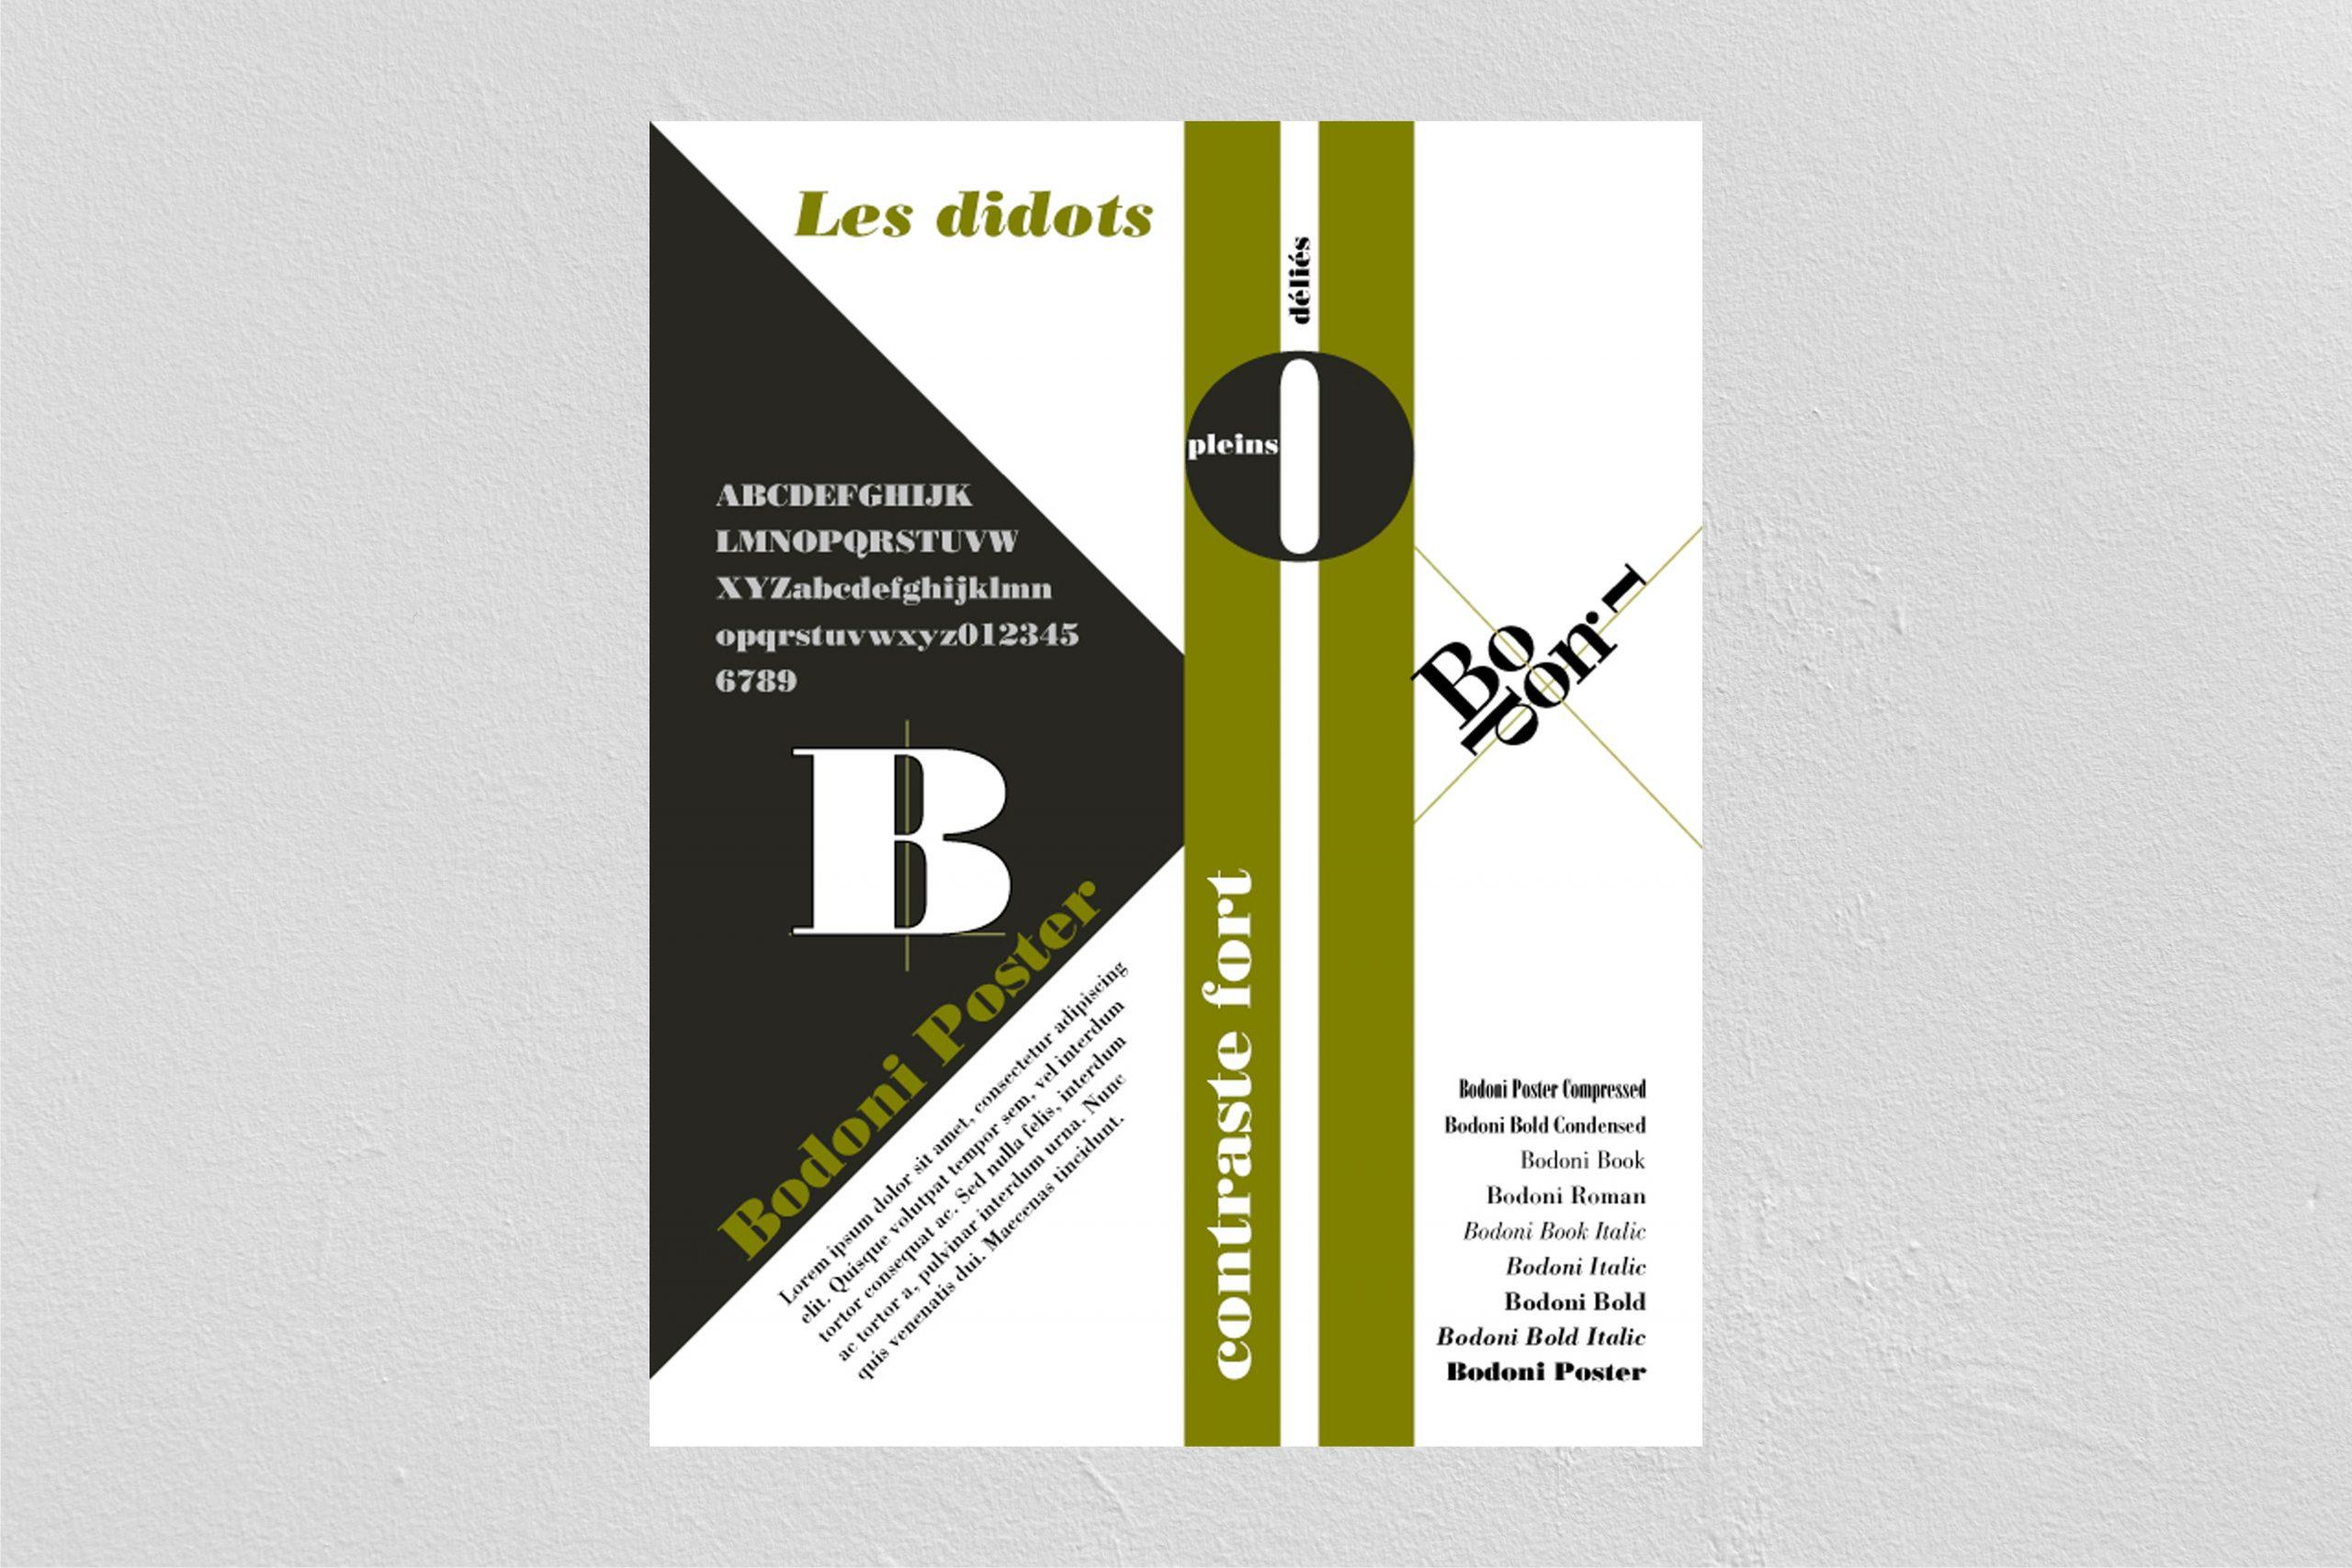 Didots - police Bodoni